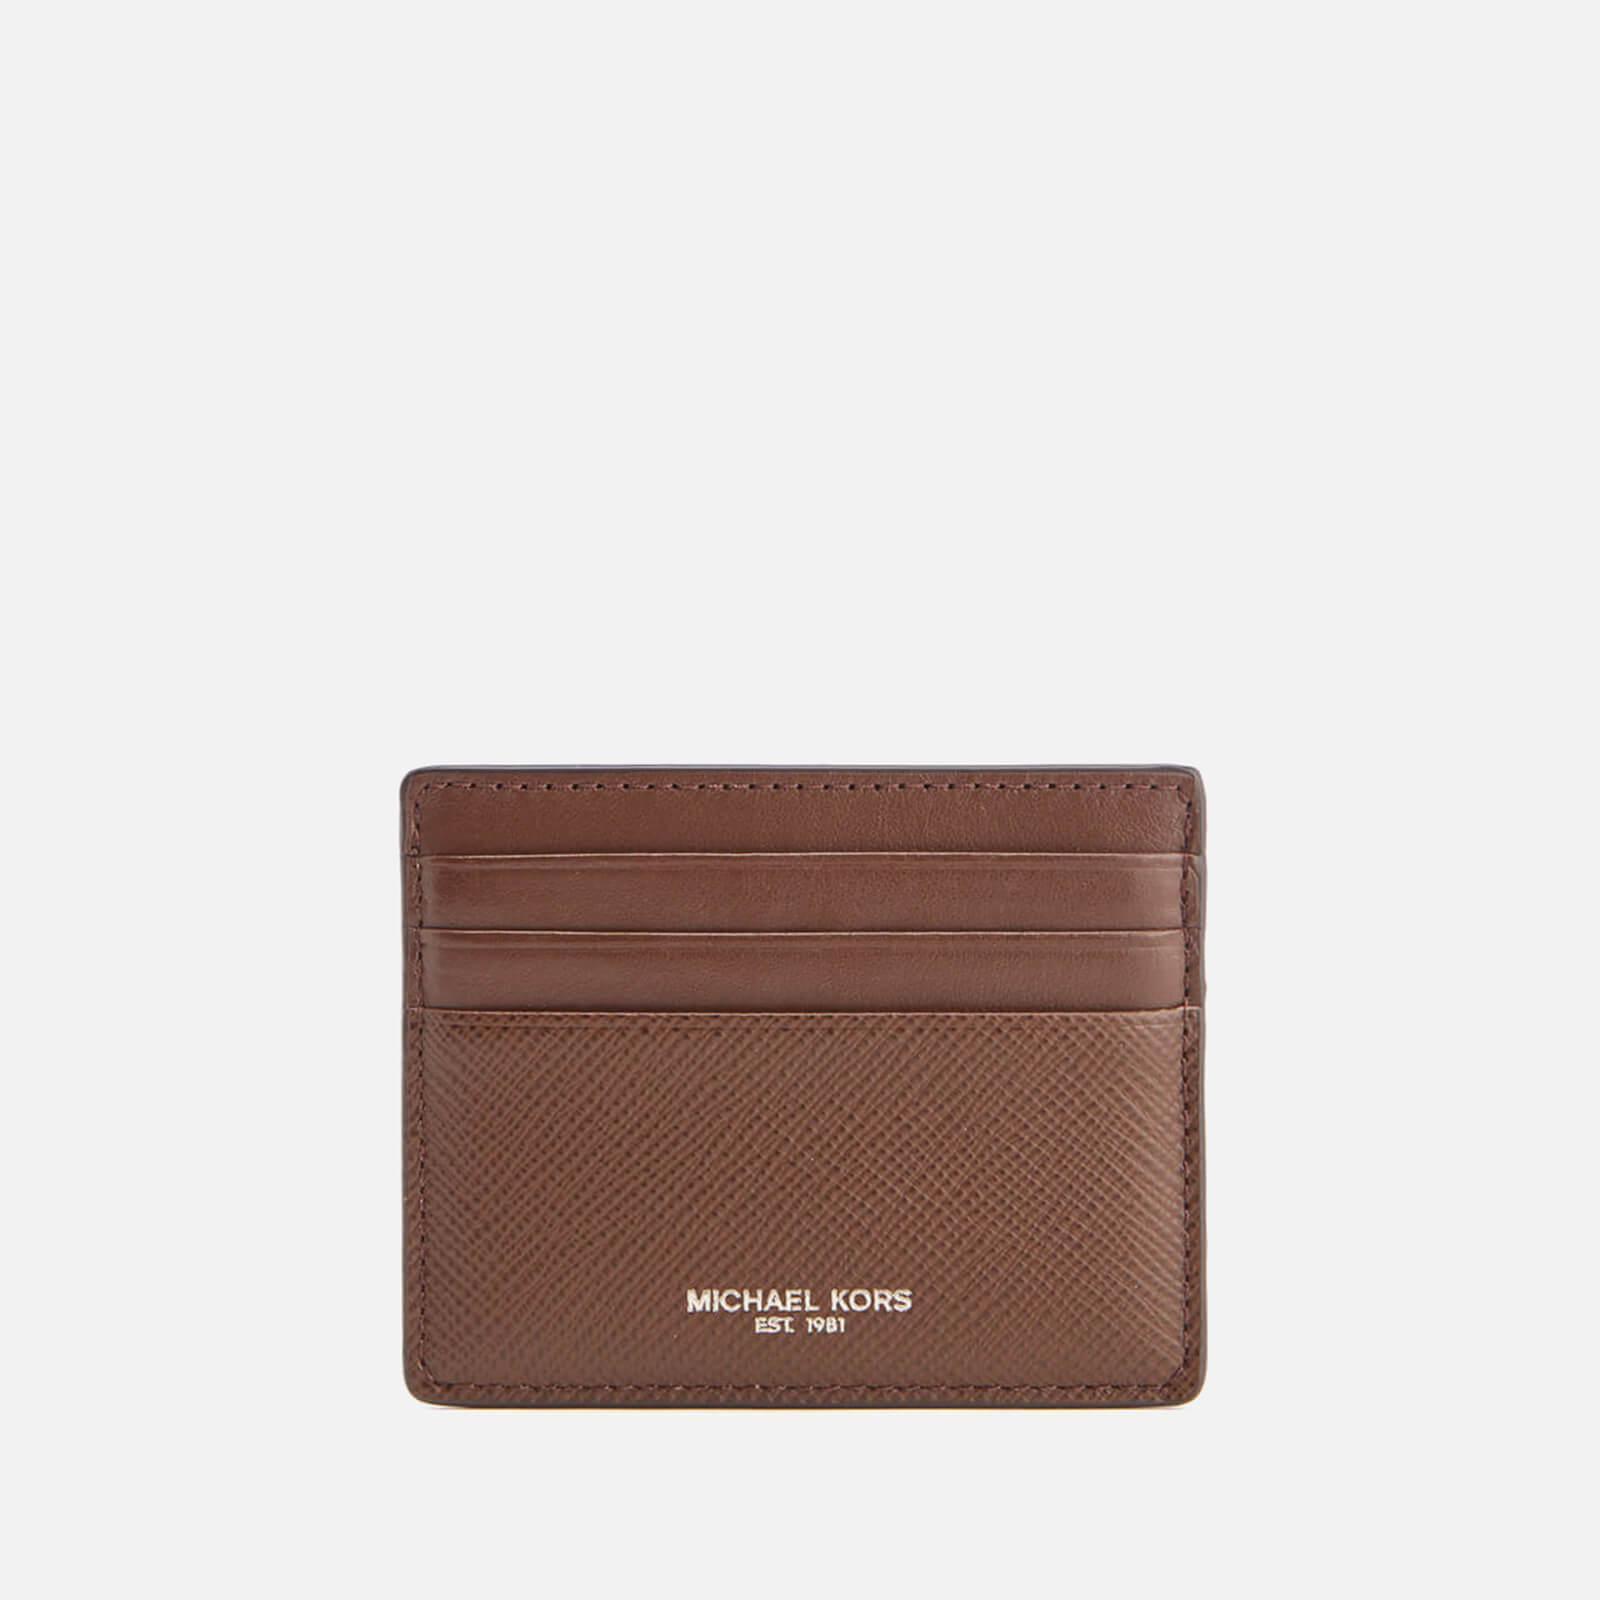 hot sale online 29376 4ffca Michael Kors Men's Harrison Tall Card Case - Mocha